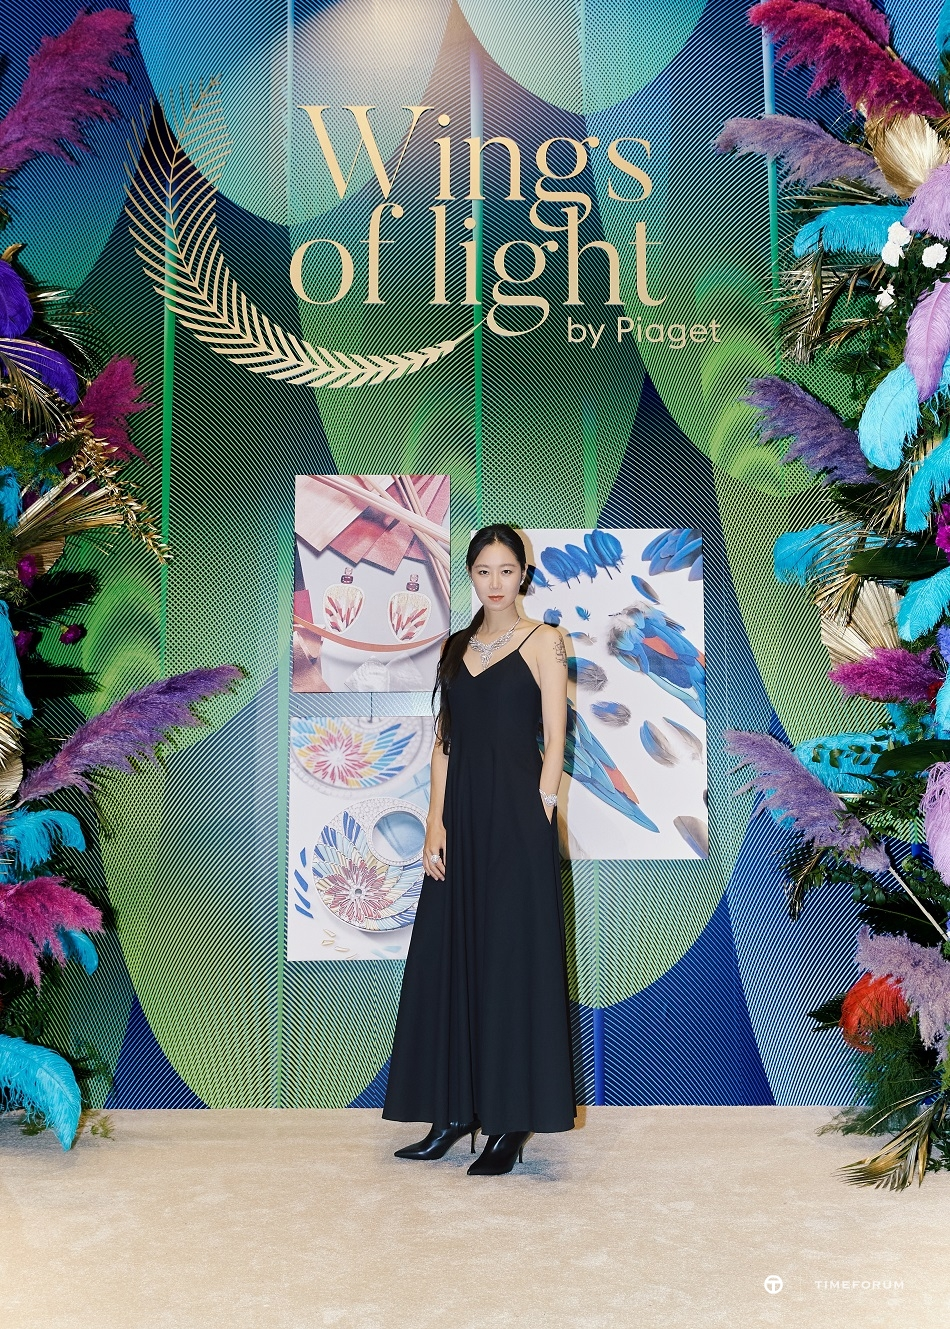 PIAGET_WOL HJ EVENT_APAC Ambassador KHJ_Photocall_K1.jpg